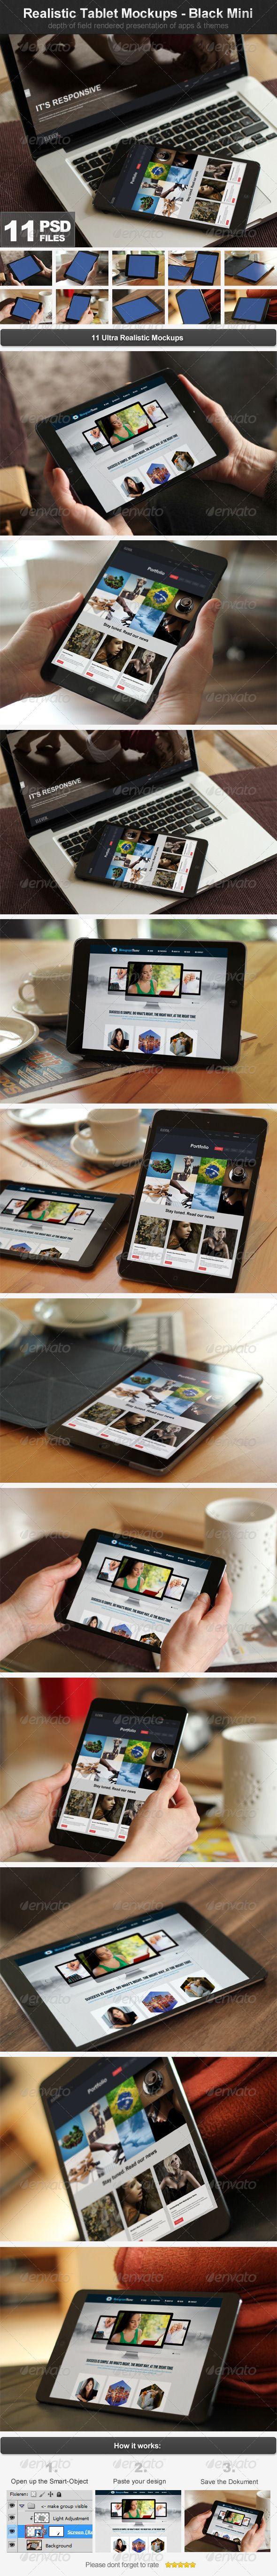 Realistic Tablet Mockups - Black Mini - Mobile Displays